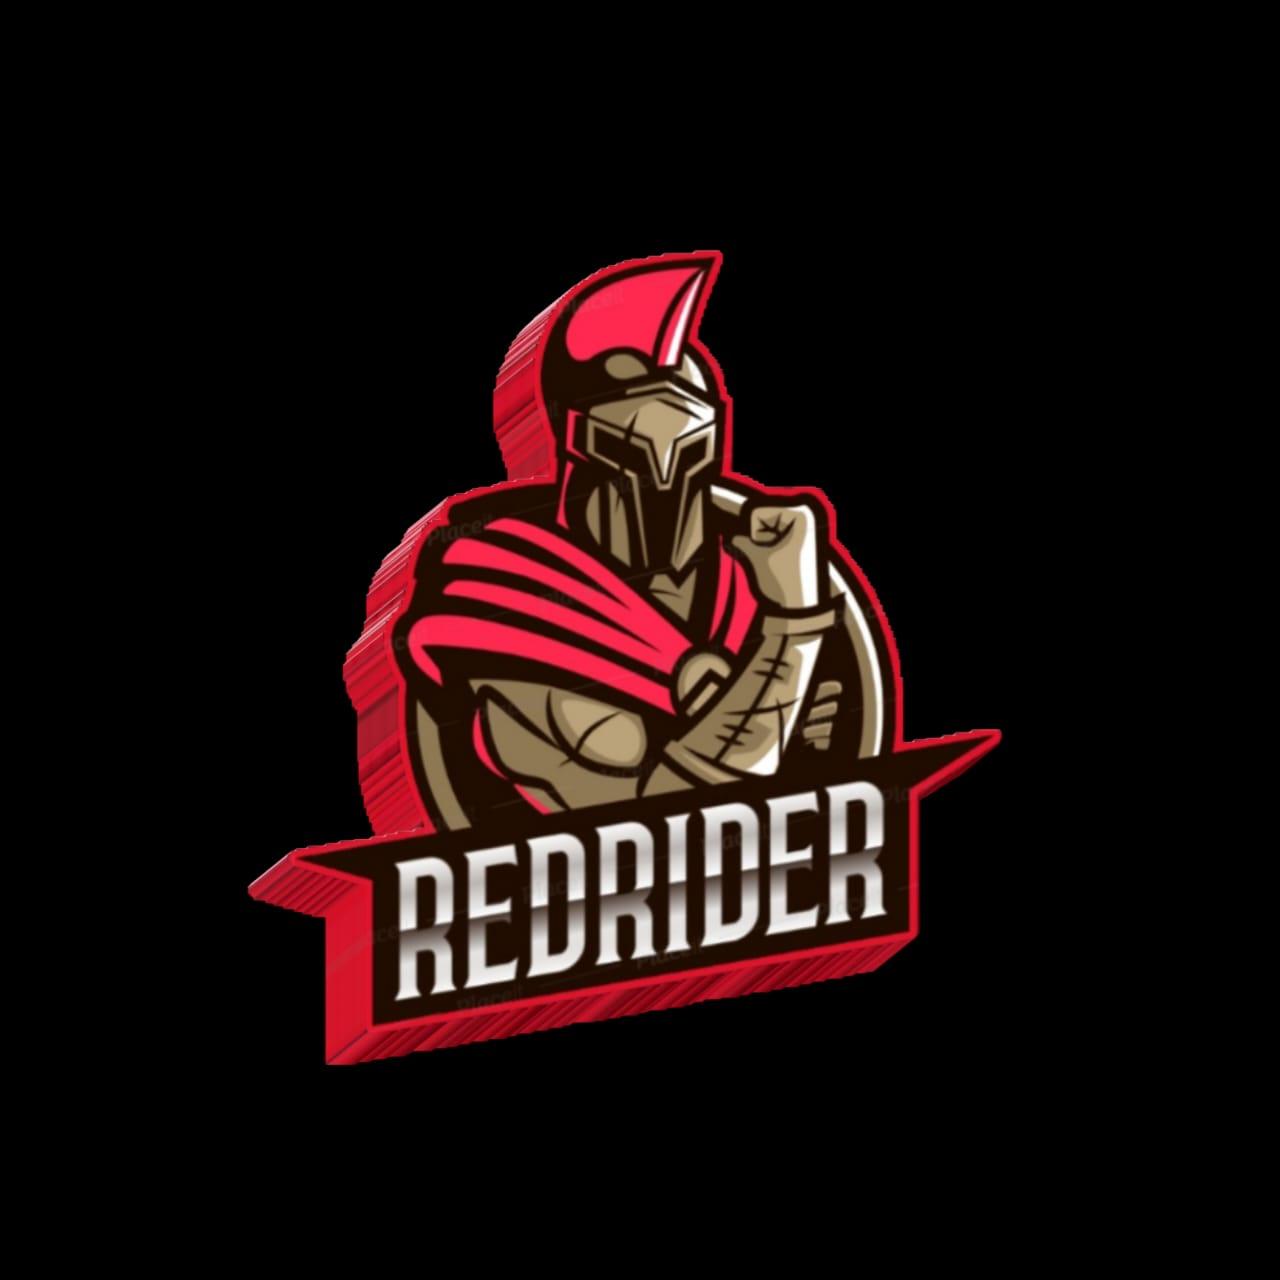 REDRIDER CLAN OF PUBG MOBILE LITE